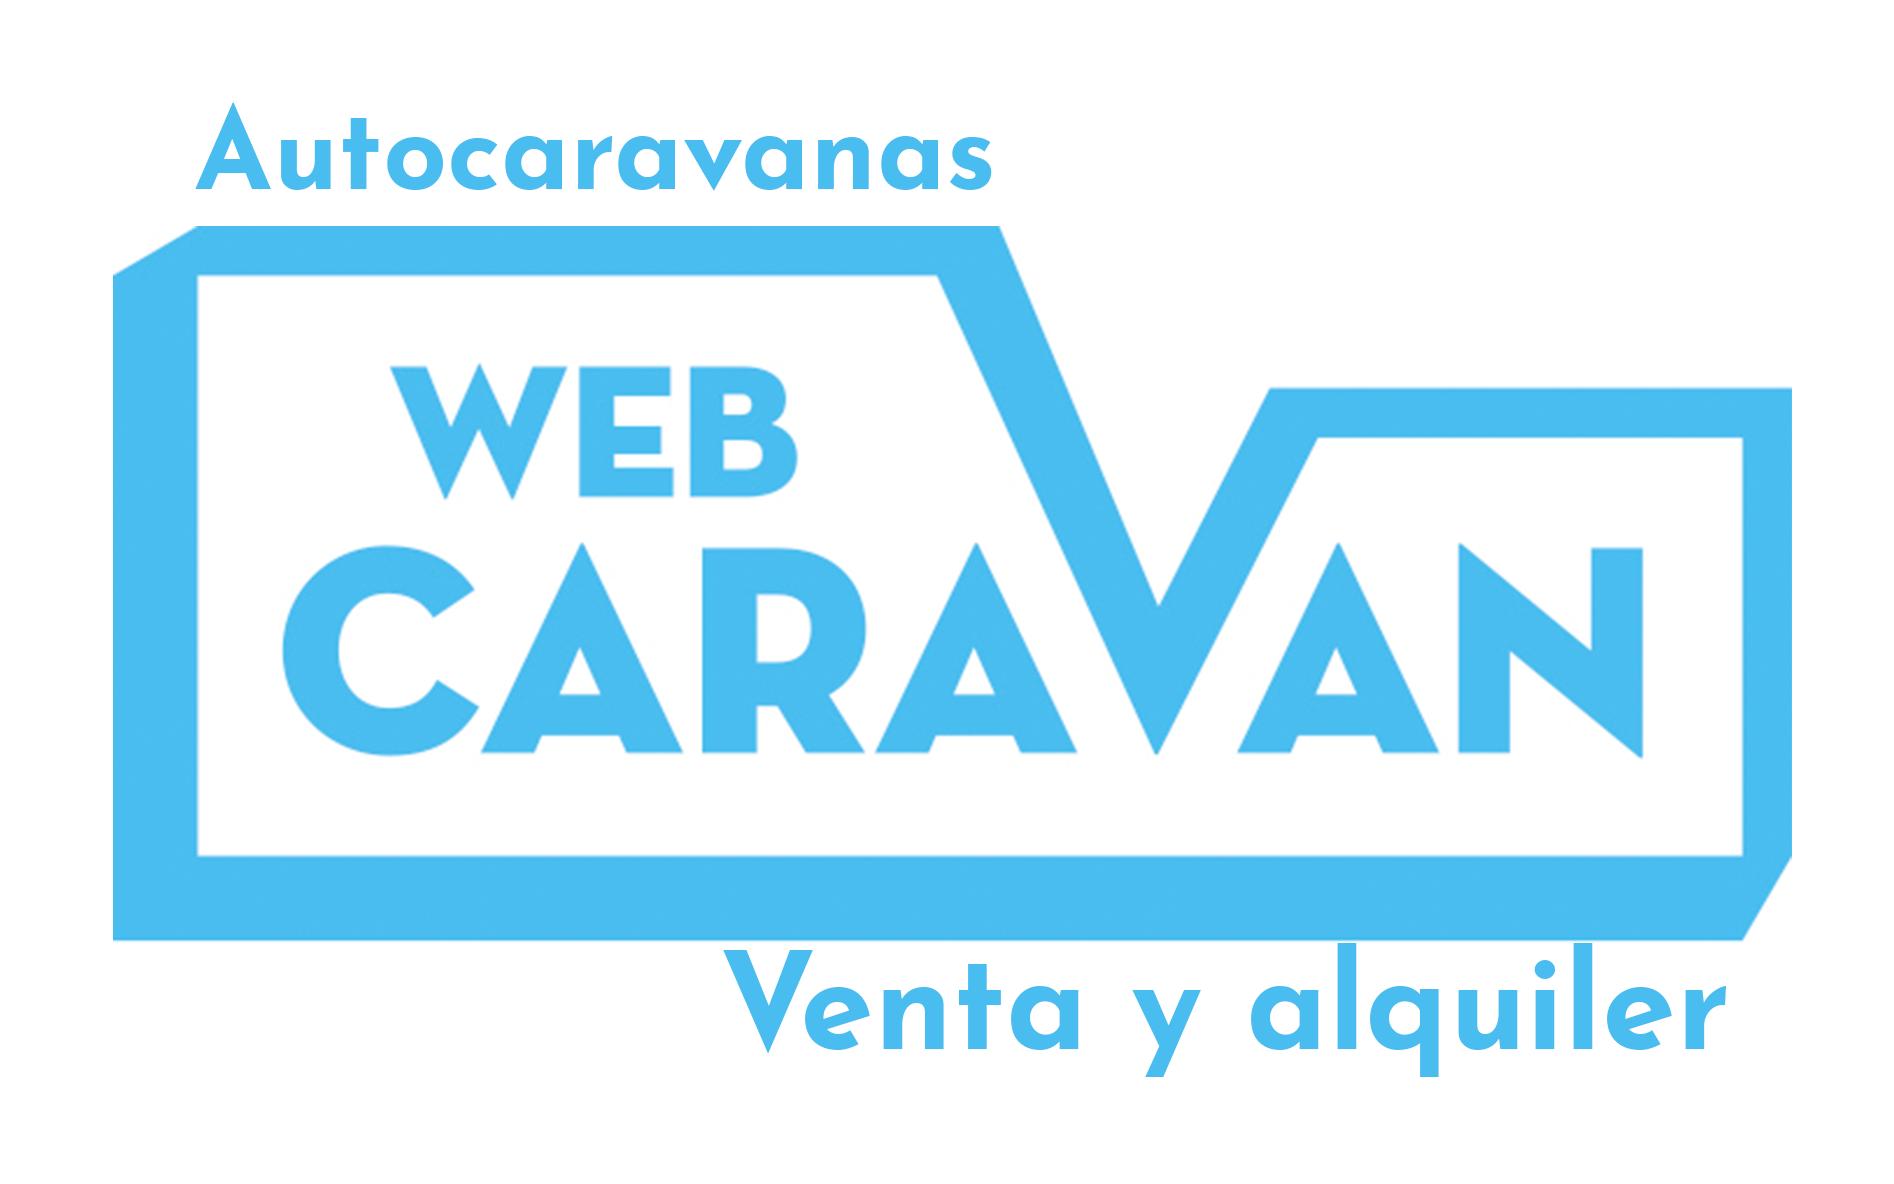 https://ev4doc.s3.eu-west-1.amazonaws.com/webcaravan/documentos/webcaravan/catalogo/9493/86b861778615903a9ab34a0ca4eccaed.png